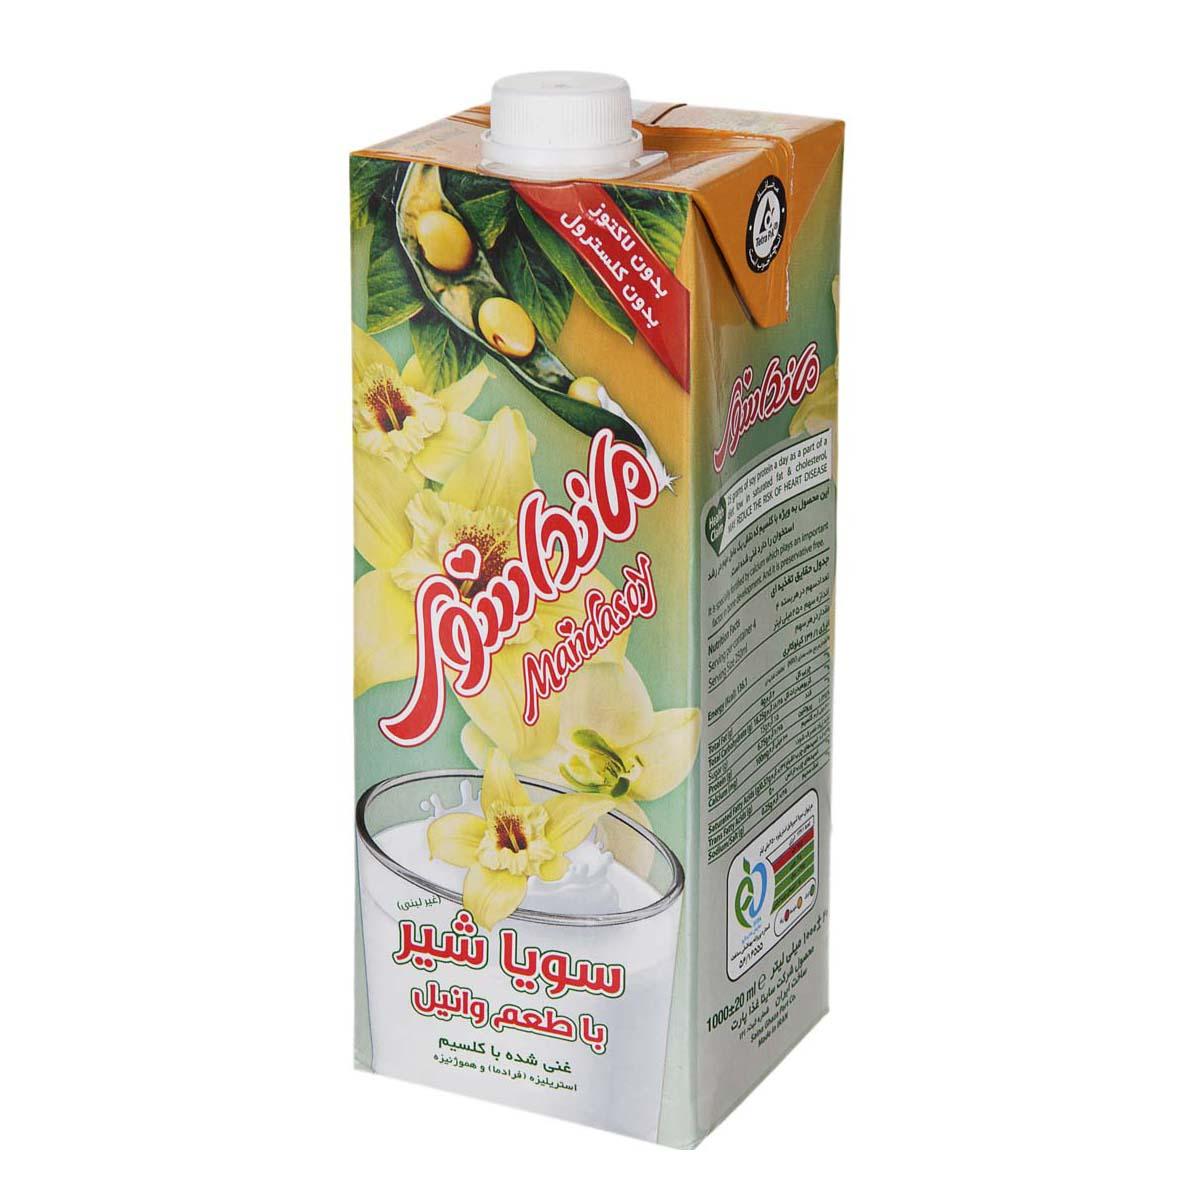 سویا شیر با طعم وانیل مانداسوی حجم ۲۰۰ میلی لیتر